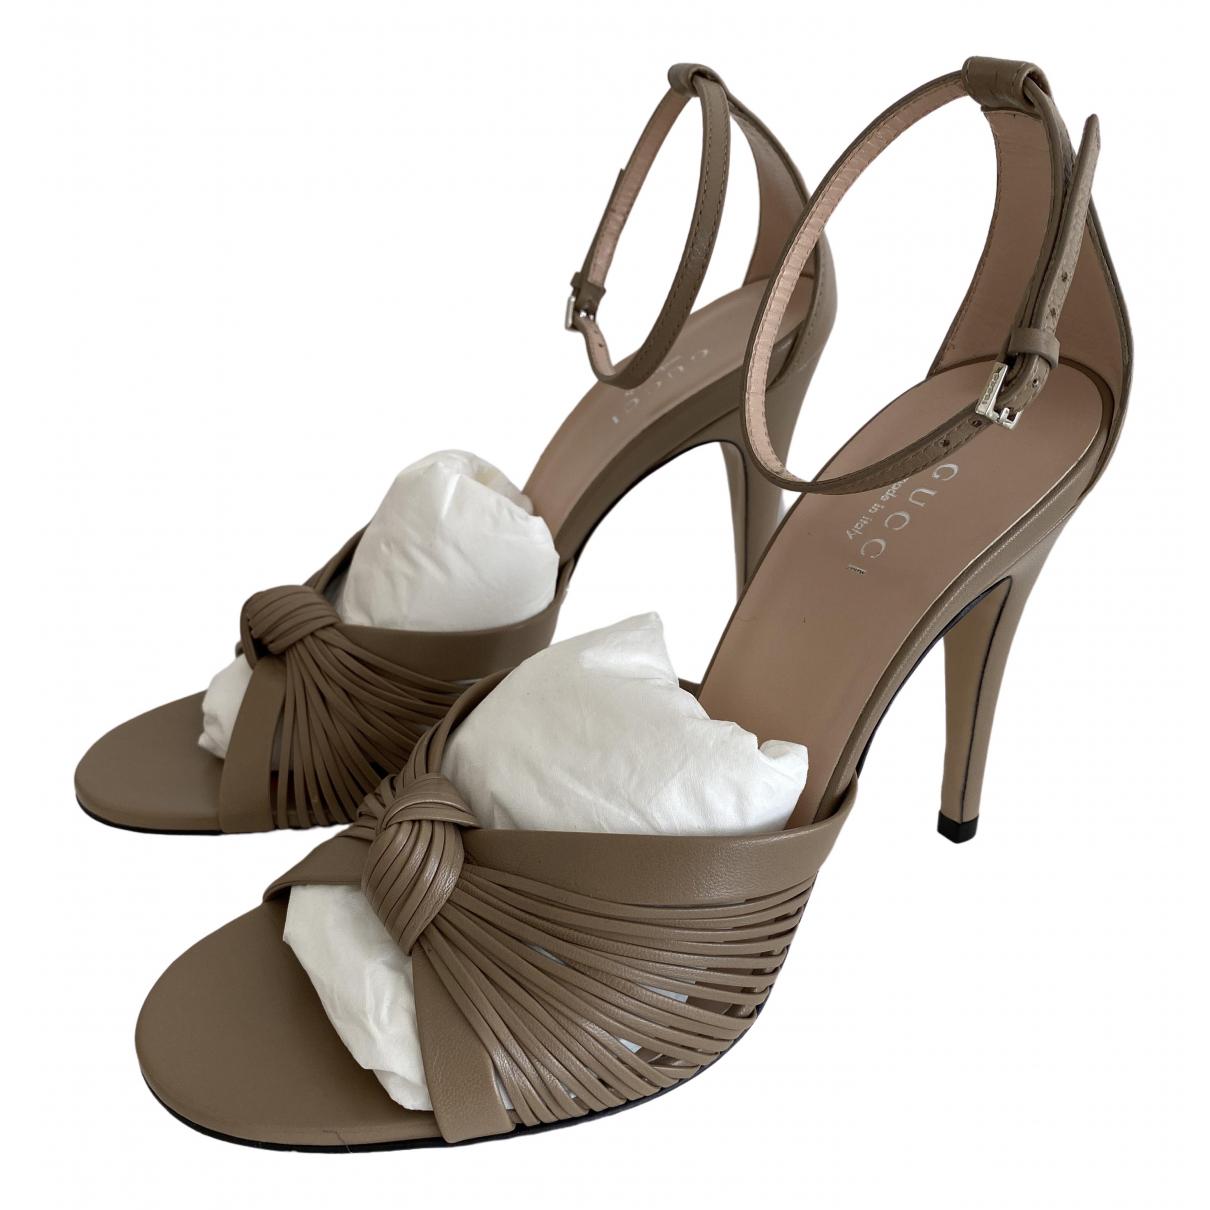 Gucci \N Beige Leather Sandals for Women 37.5 EU